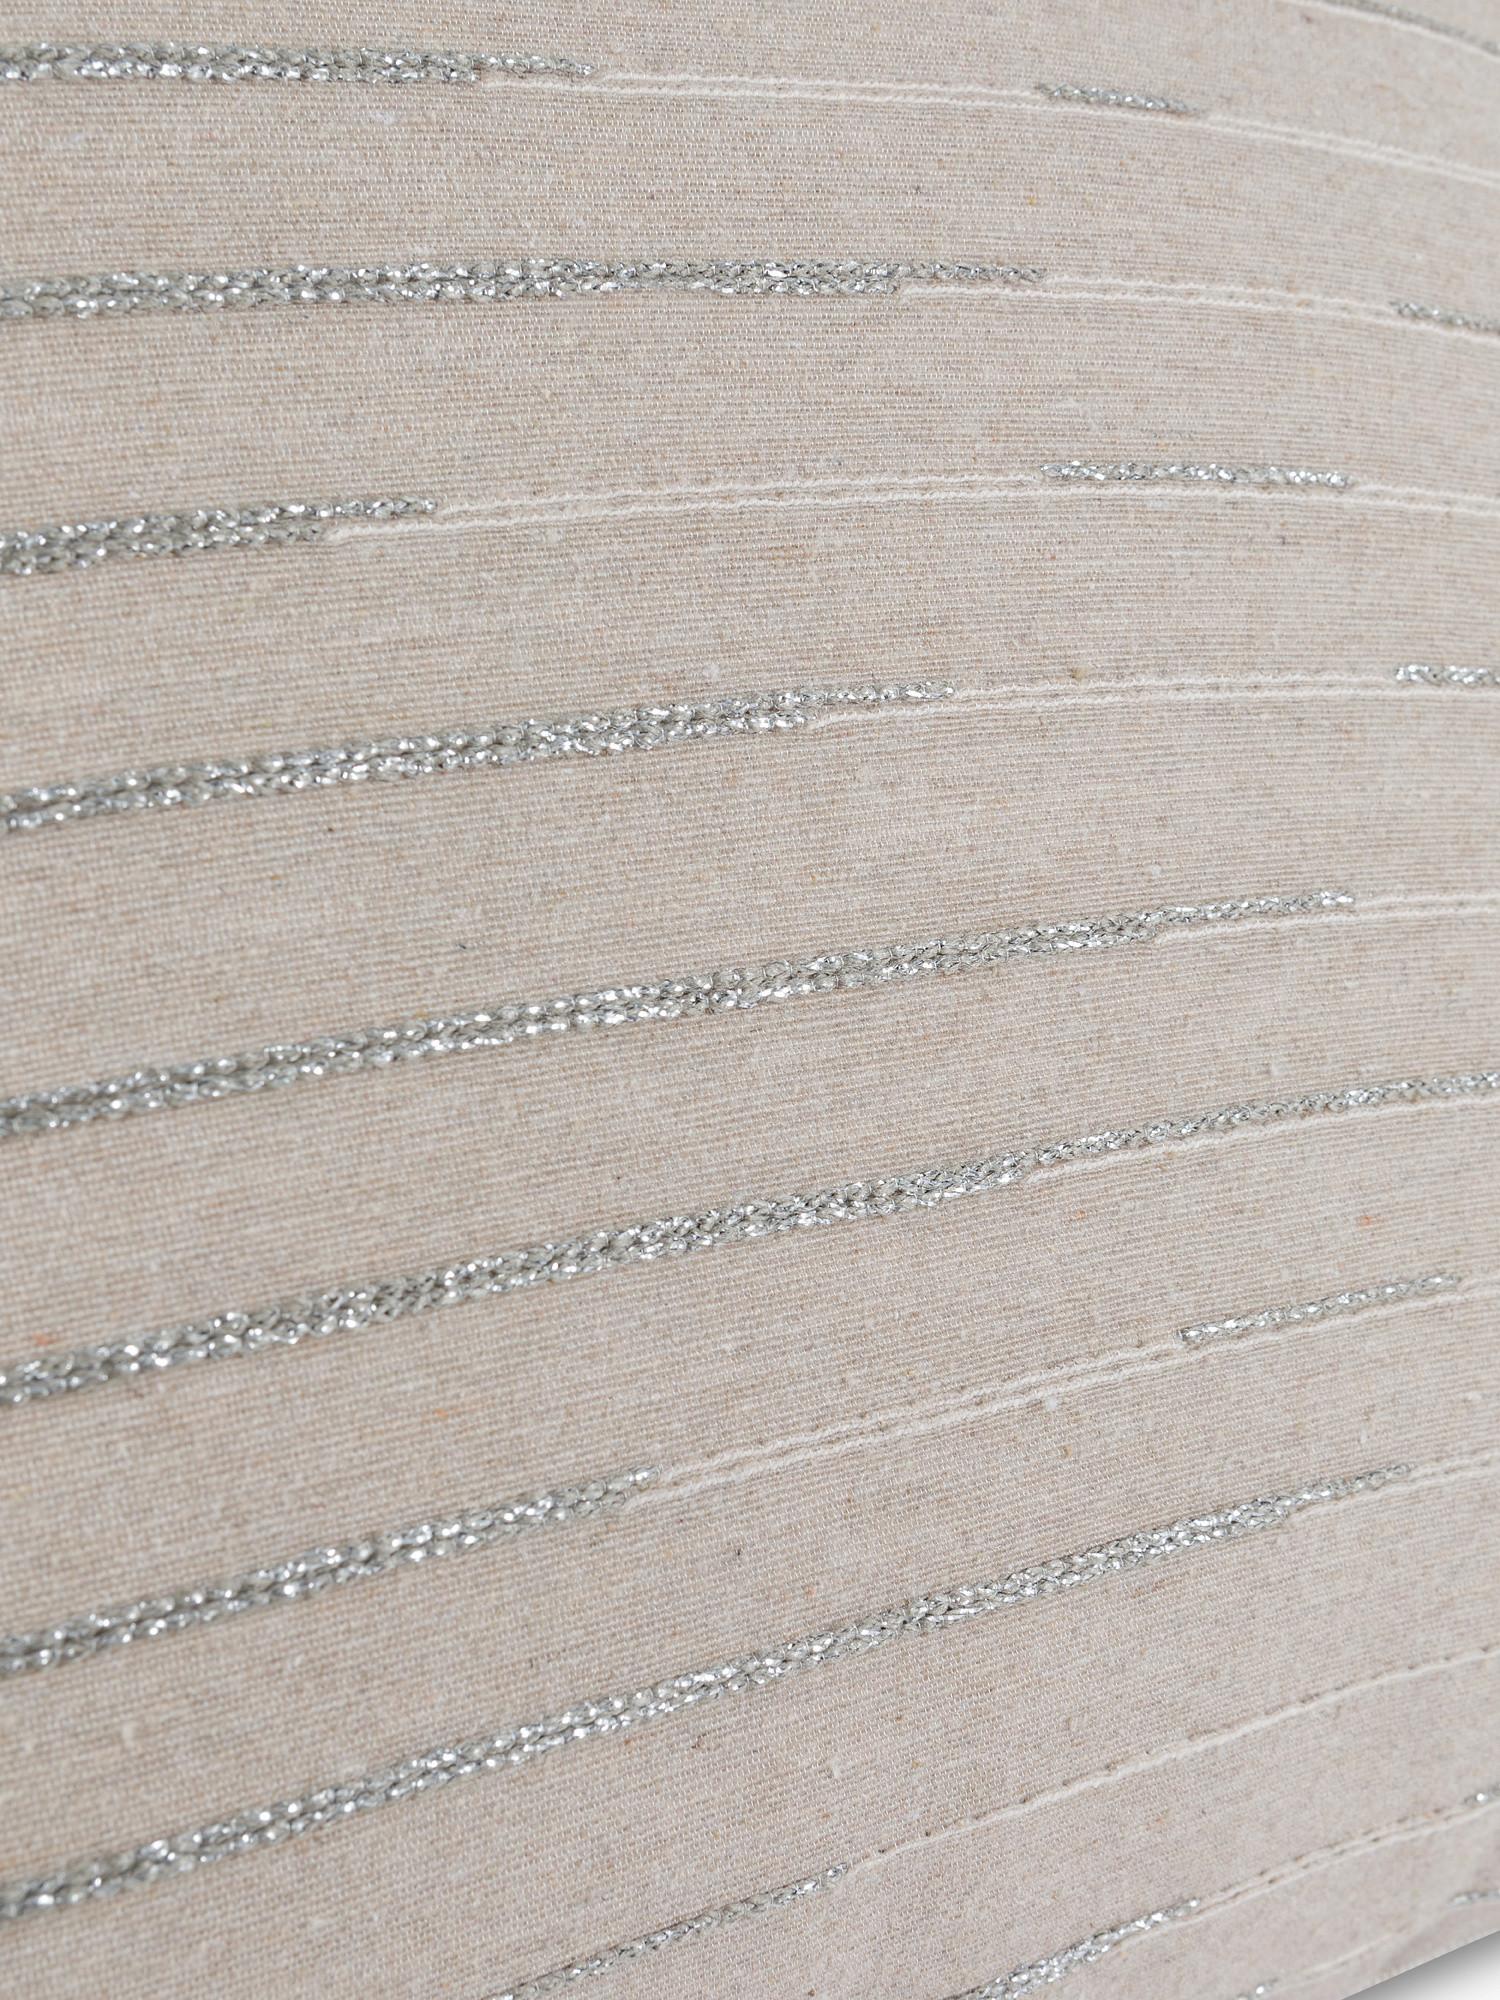 Cuscino tessuto jacquard lurex 35x55cm, Multicolor, large image number 2